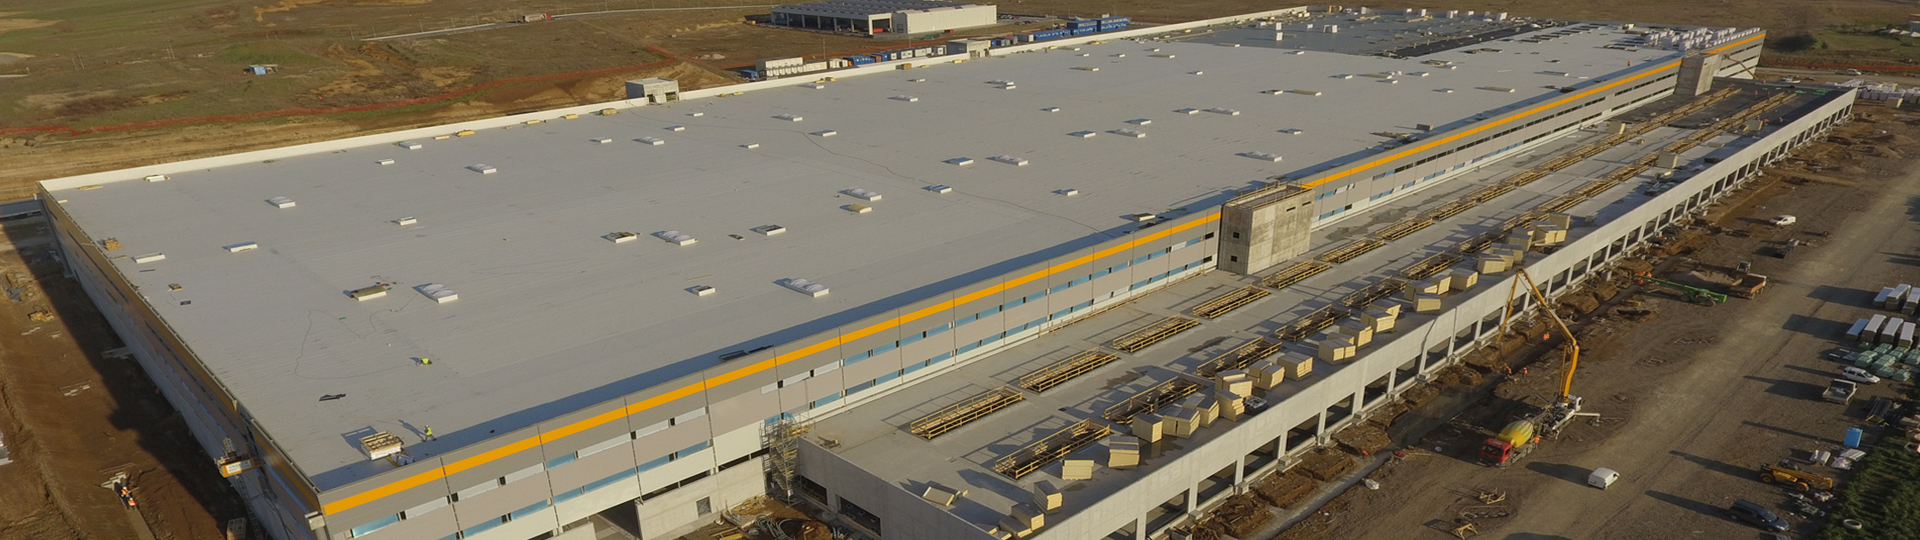 Amazon logistic center - Rieti - Italy